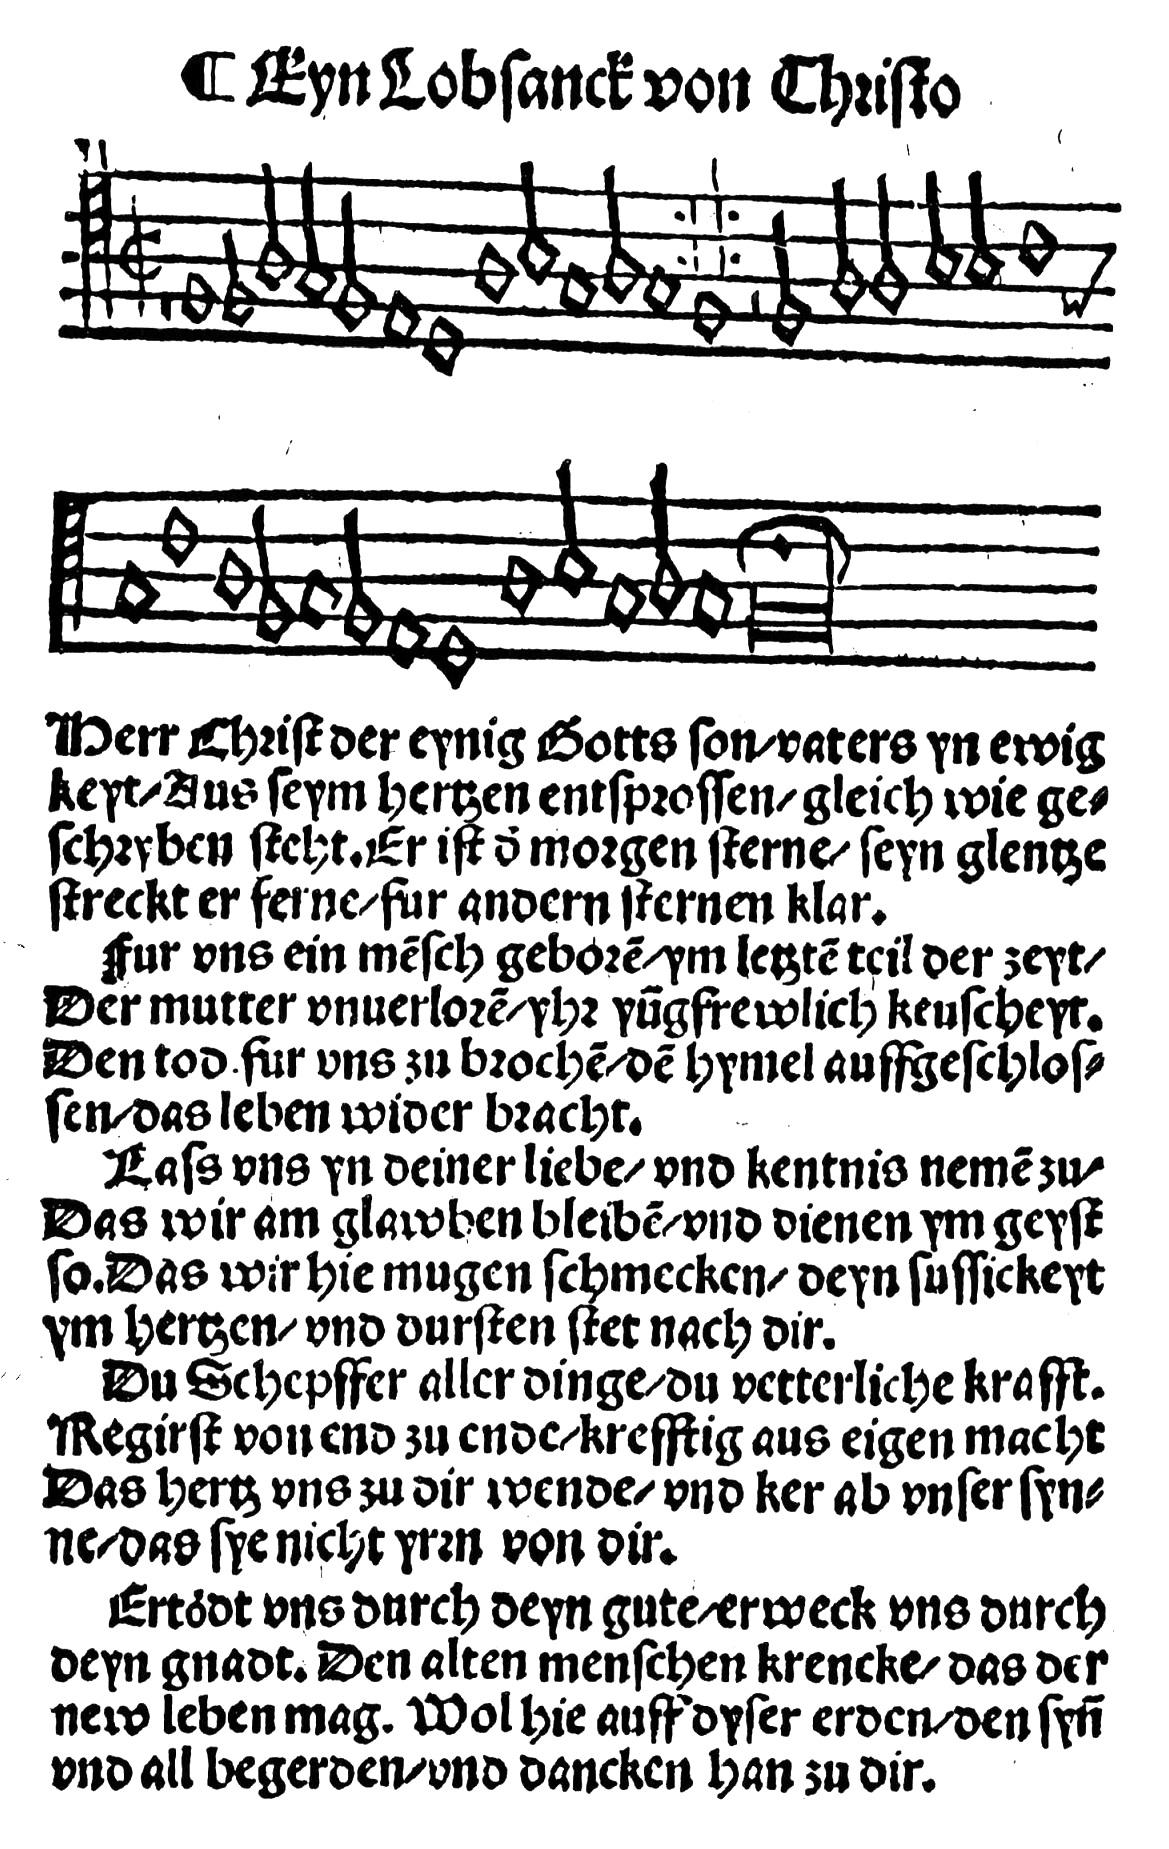 Elisabeth Cruciger's hymn in the Erfurter Enchiridion.